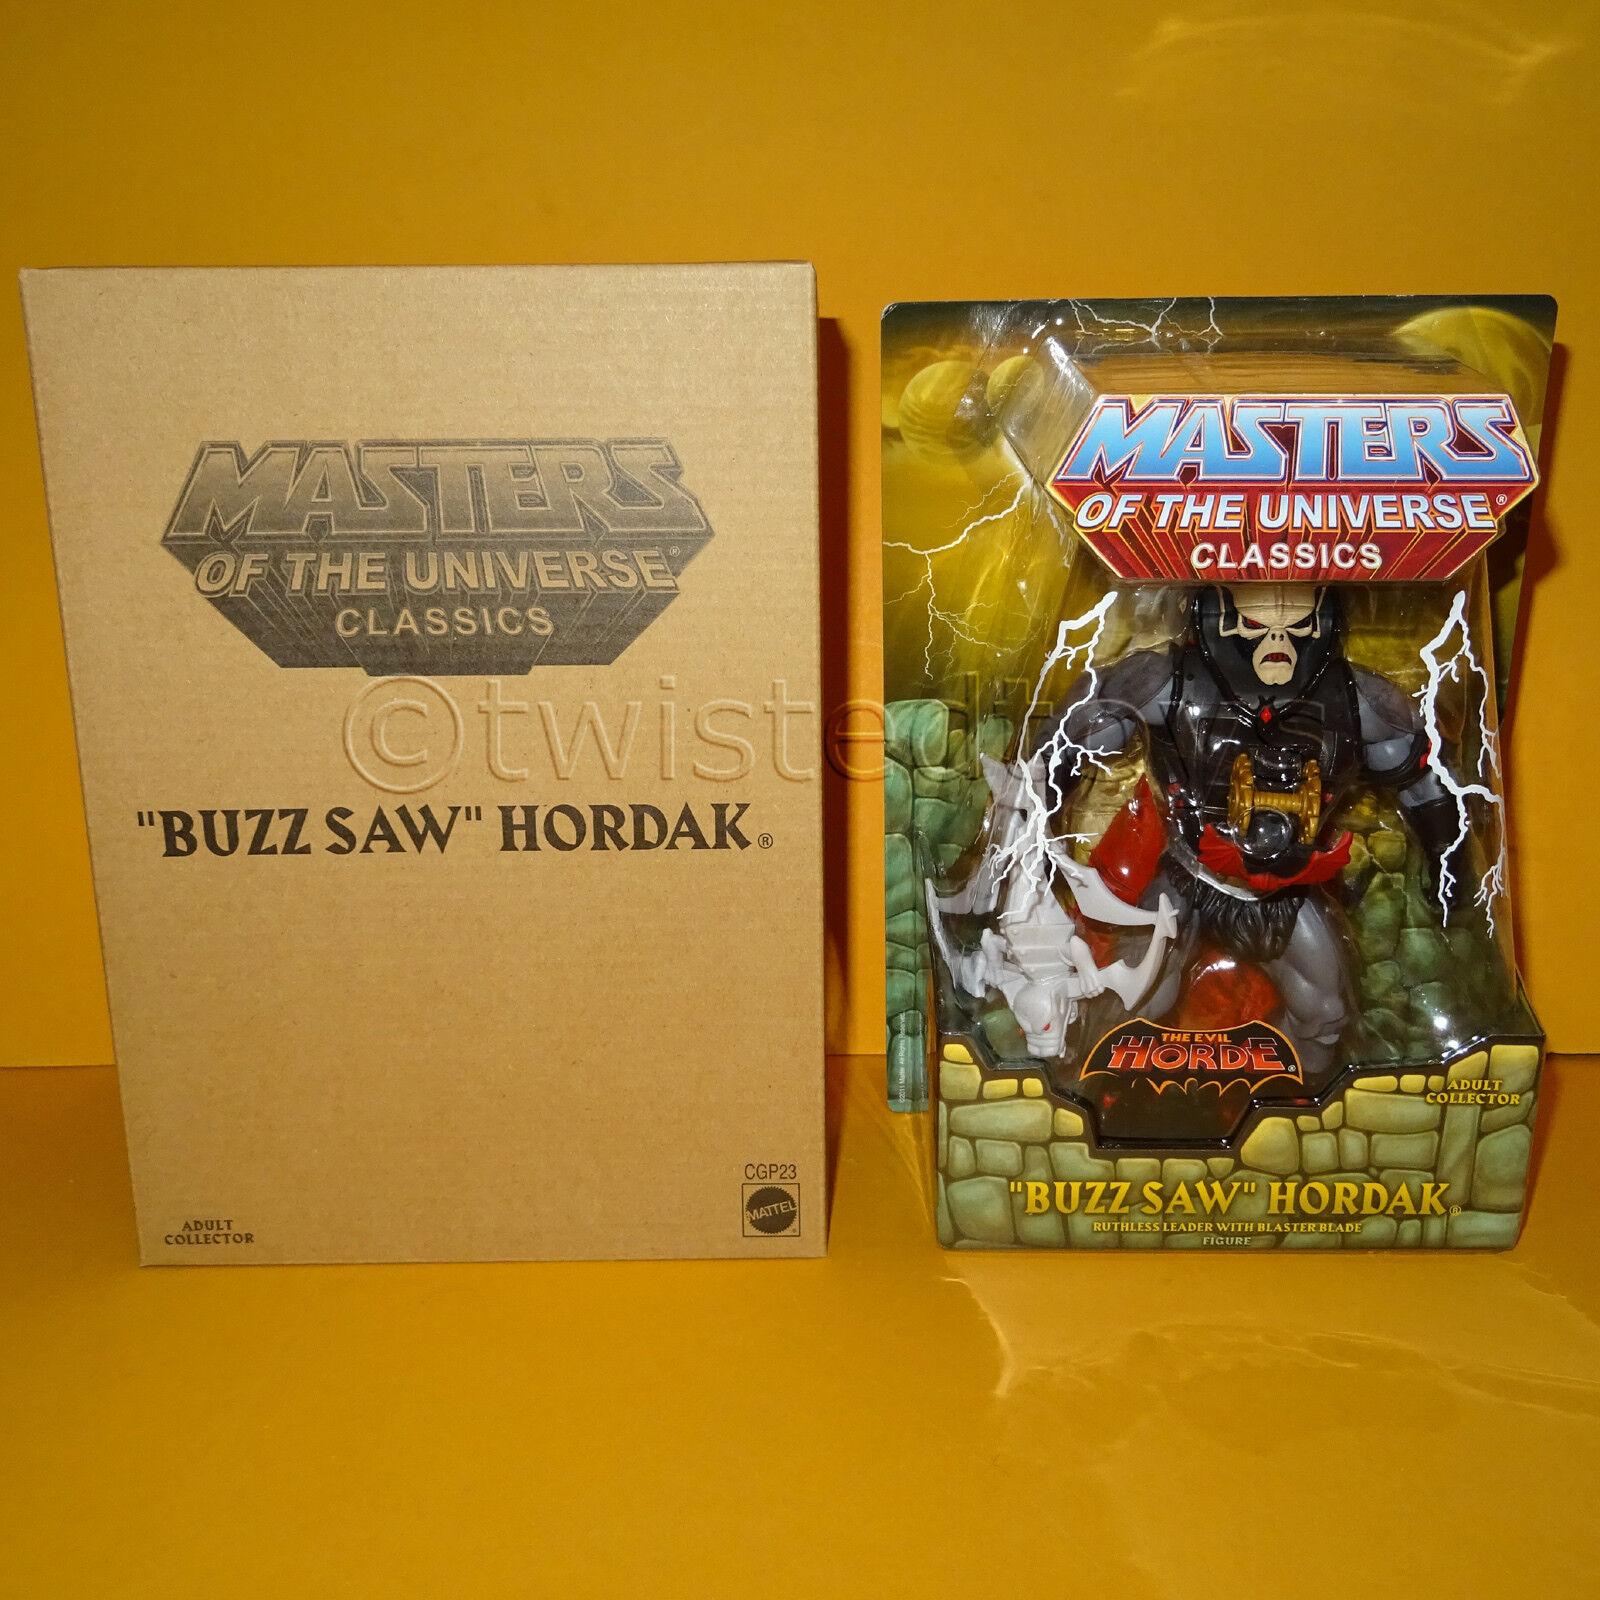 2015 MATTEL MOTU HE-MAN MASTERS OF THE UNIVERSE CLASSICS  BUZZ SAW  HORDAK MOC